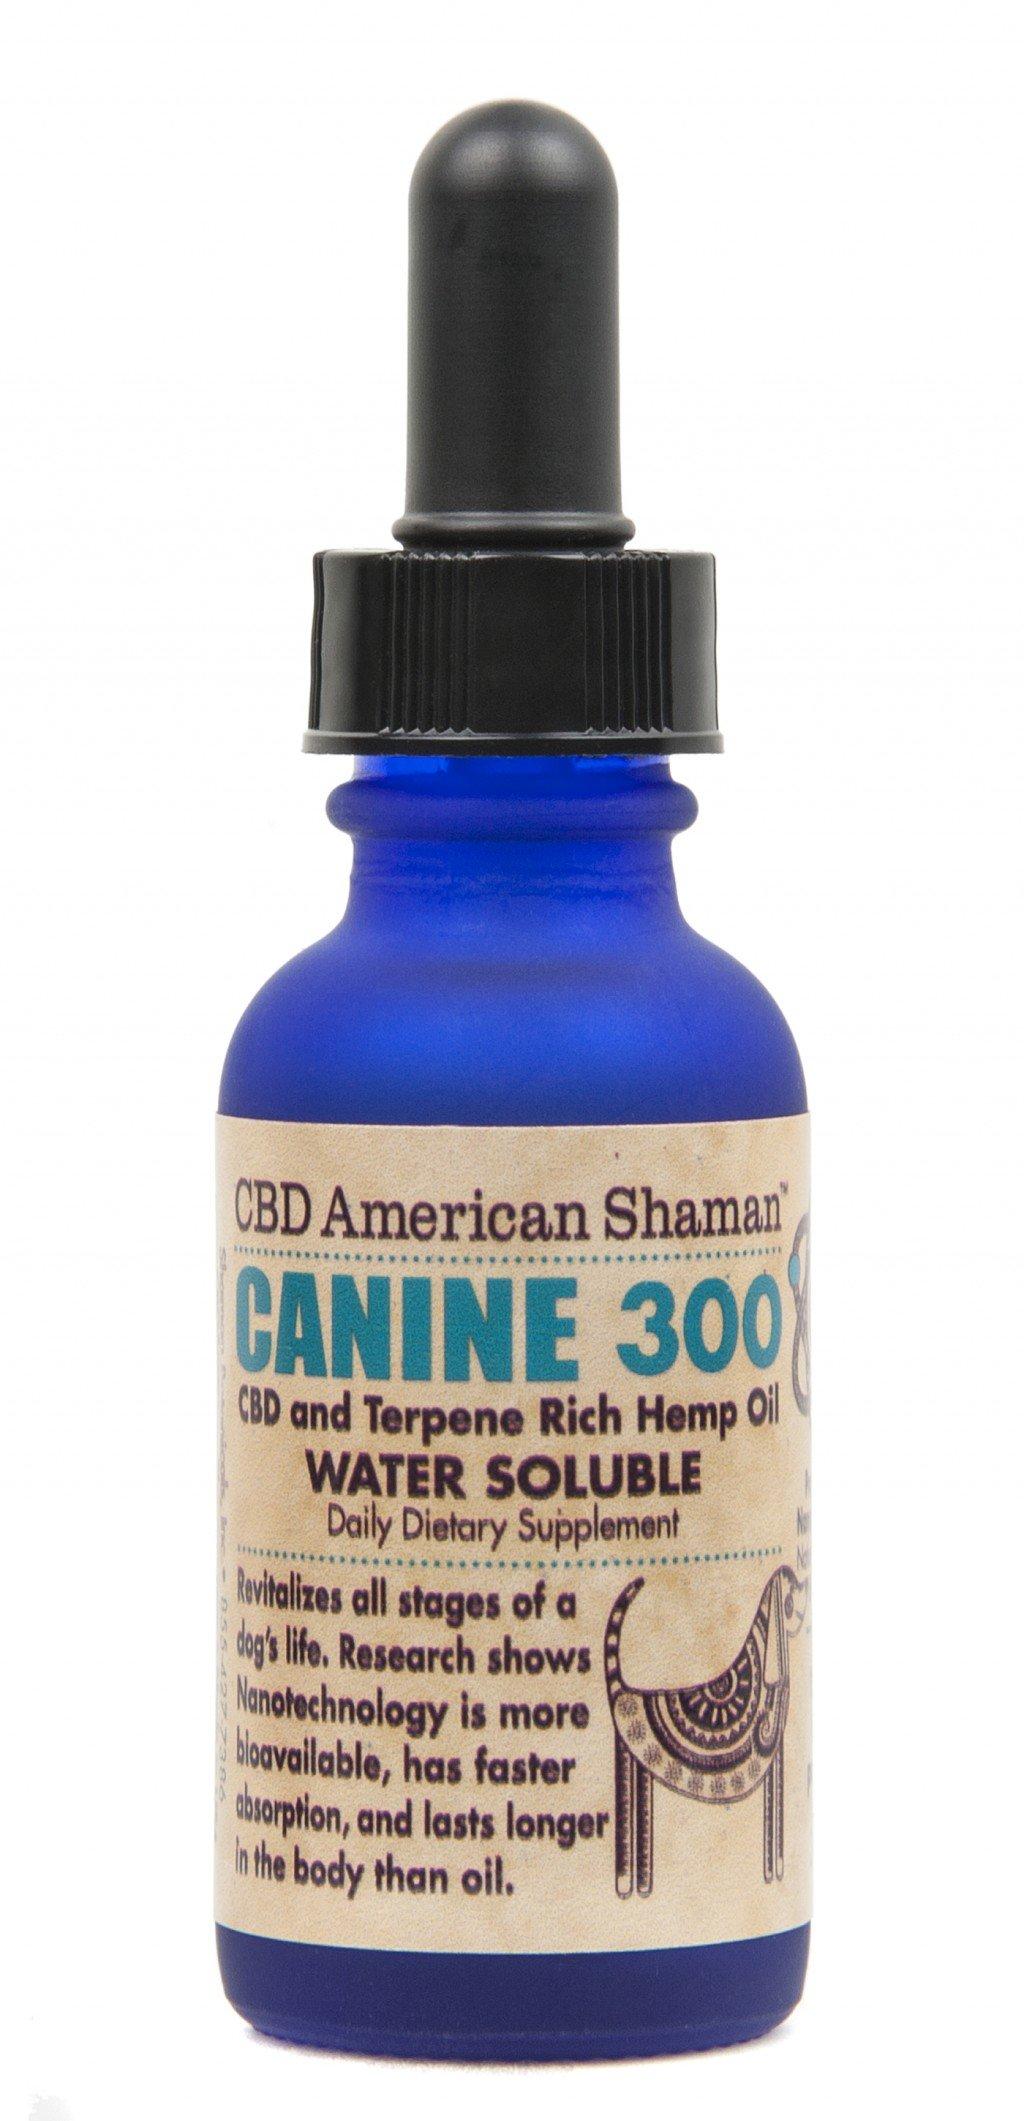 Canine CBD And Terpene Rich Hemp Oil Water Soluble American Shaman